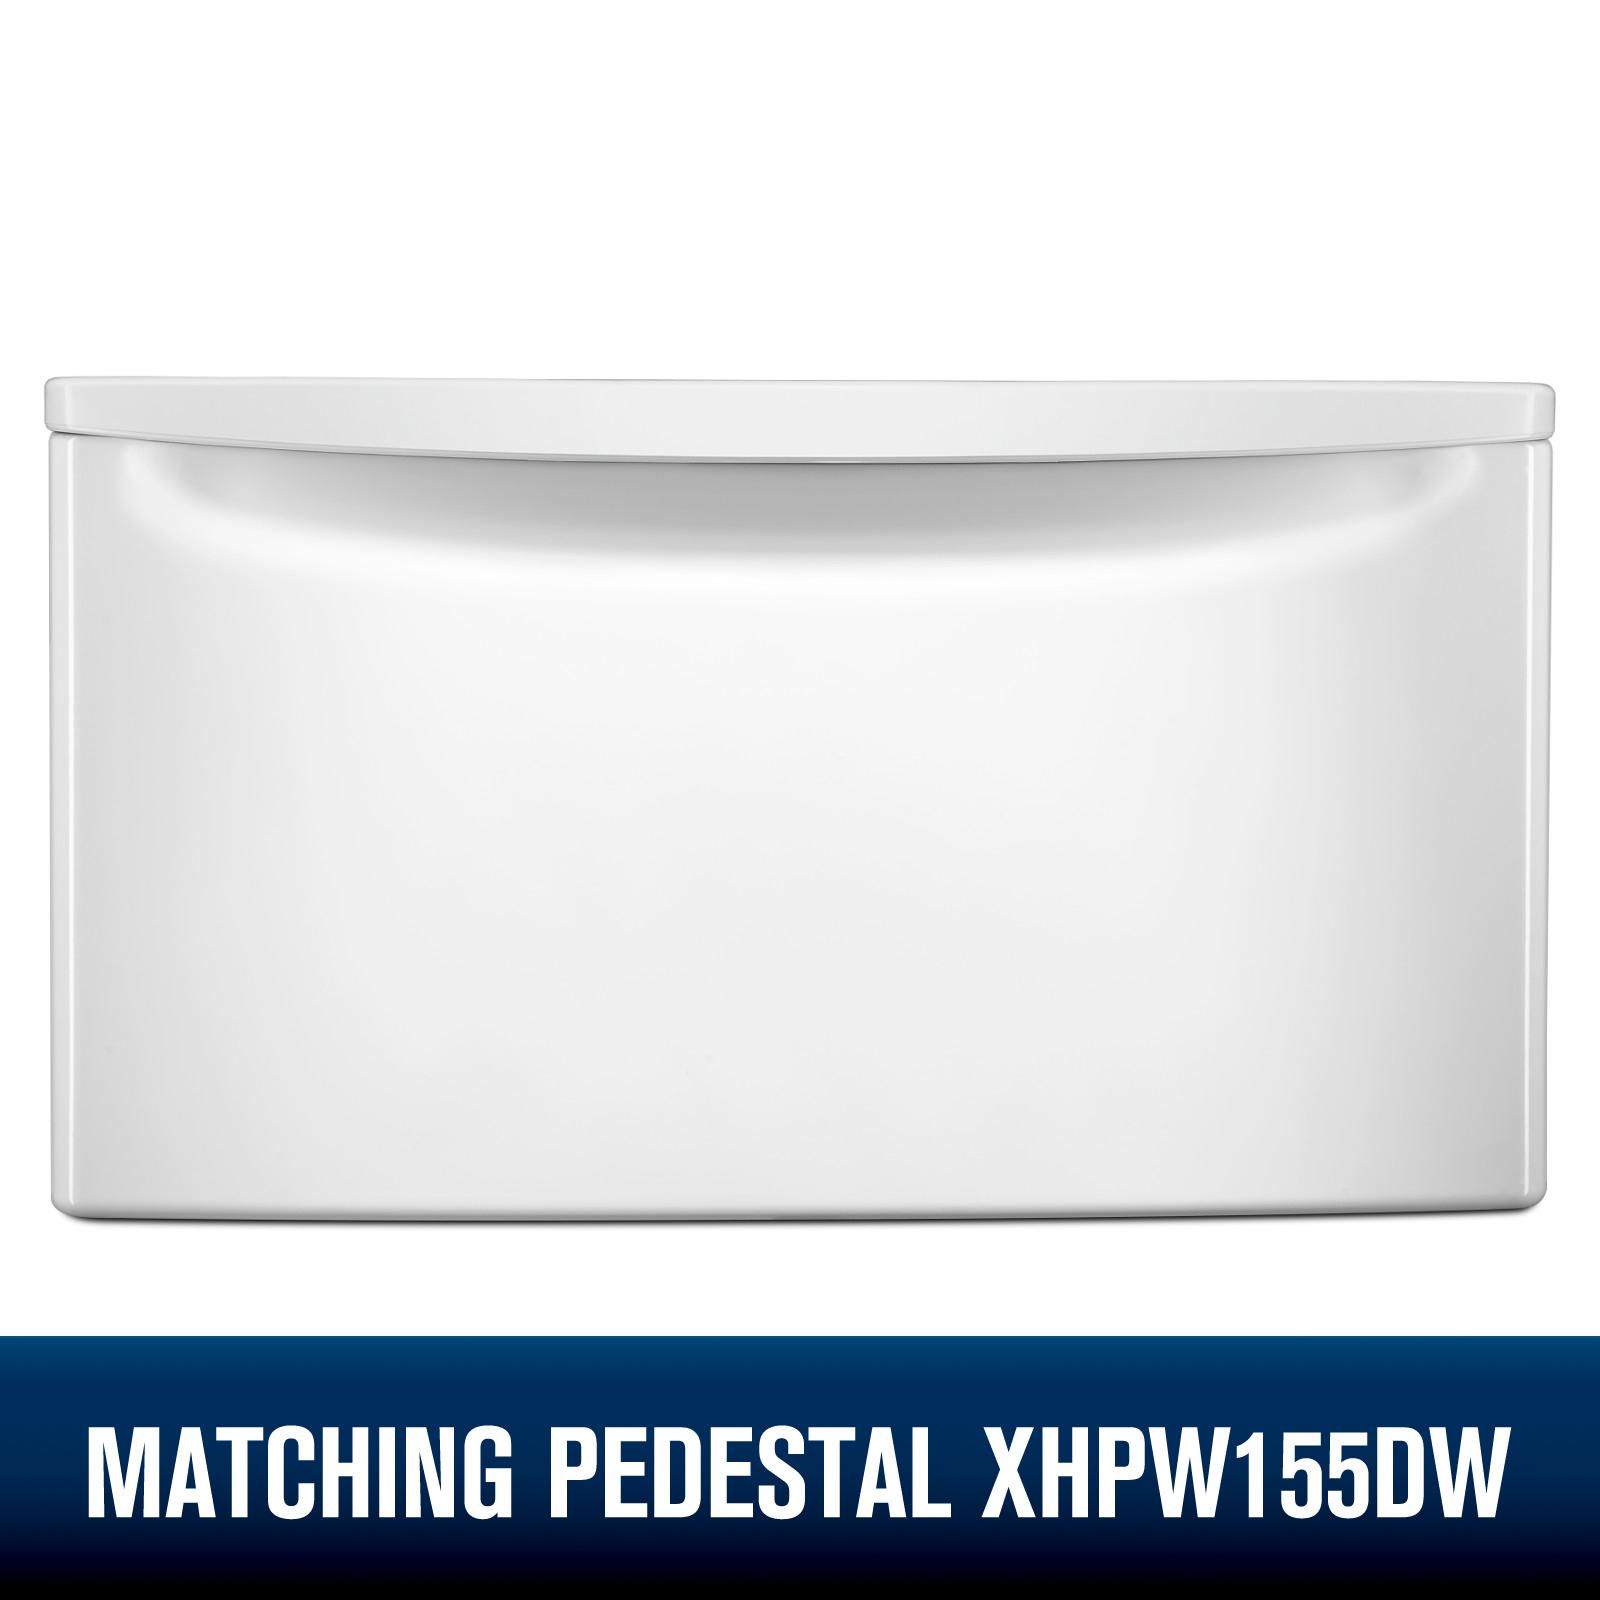 Whirlpool WGD92HEFW  7.4 cu. ft. Gas Dryer w/ Advanced Moisture Sensing - White